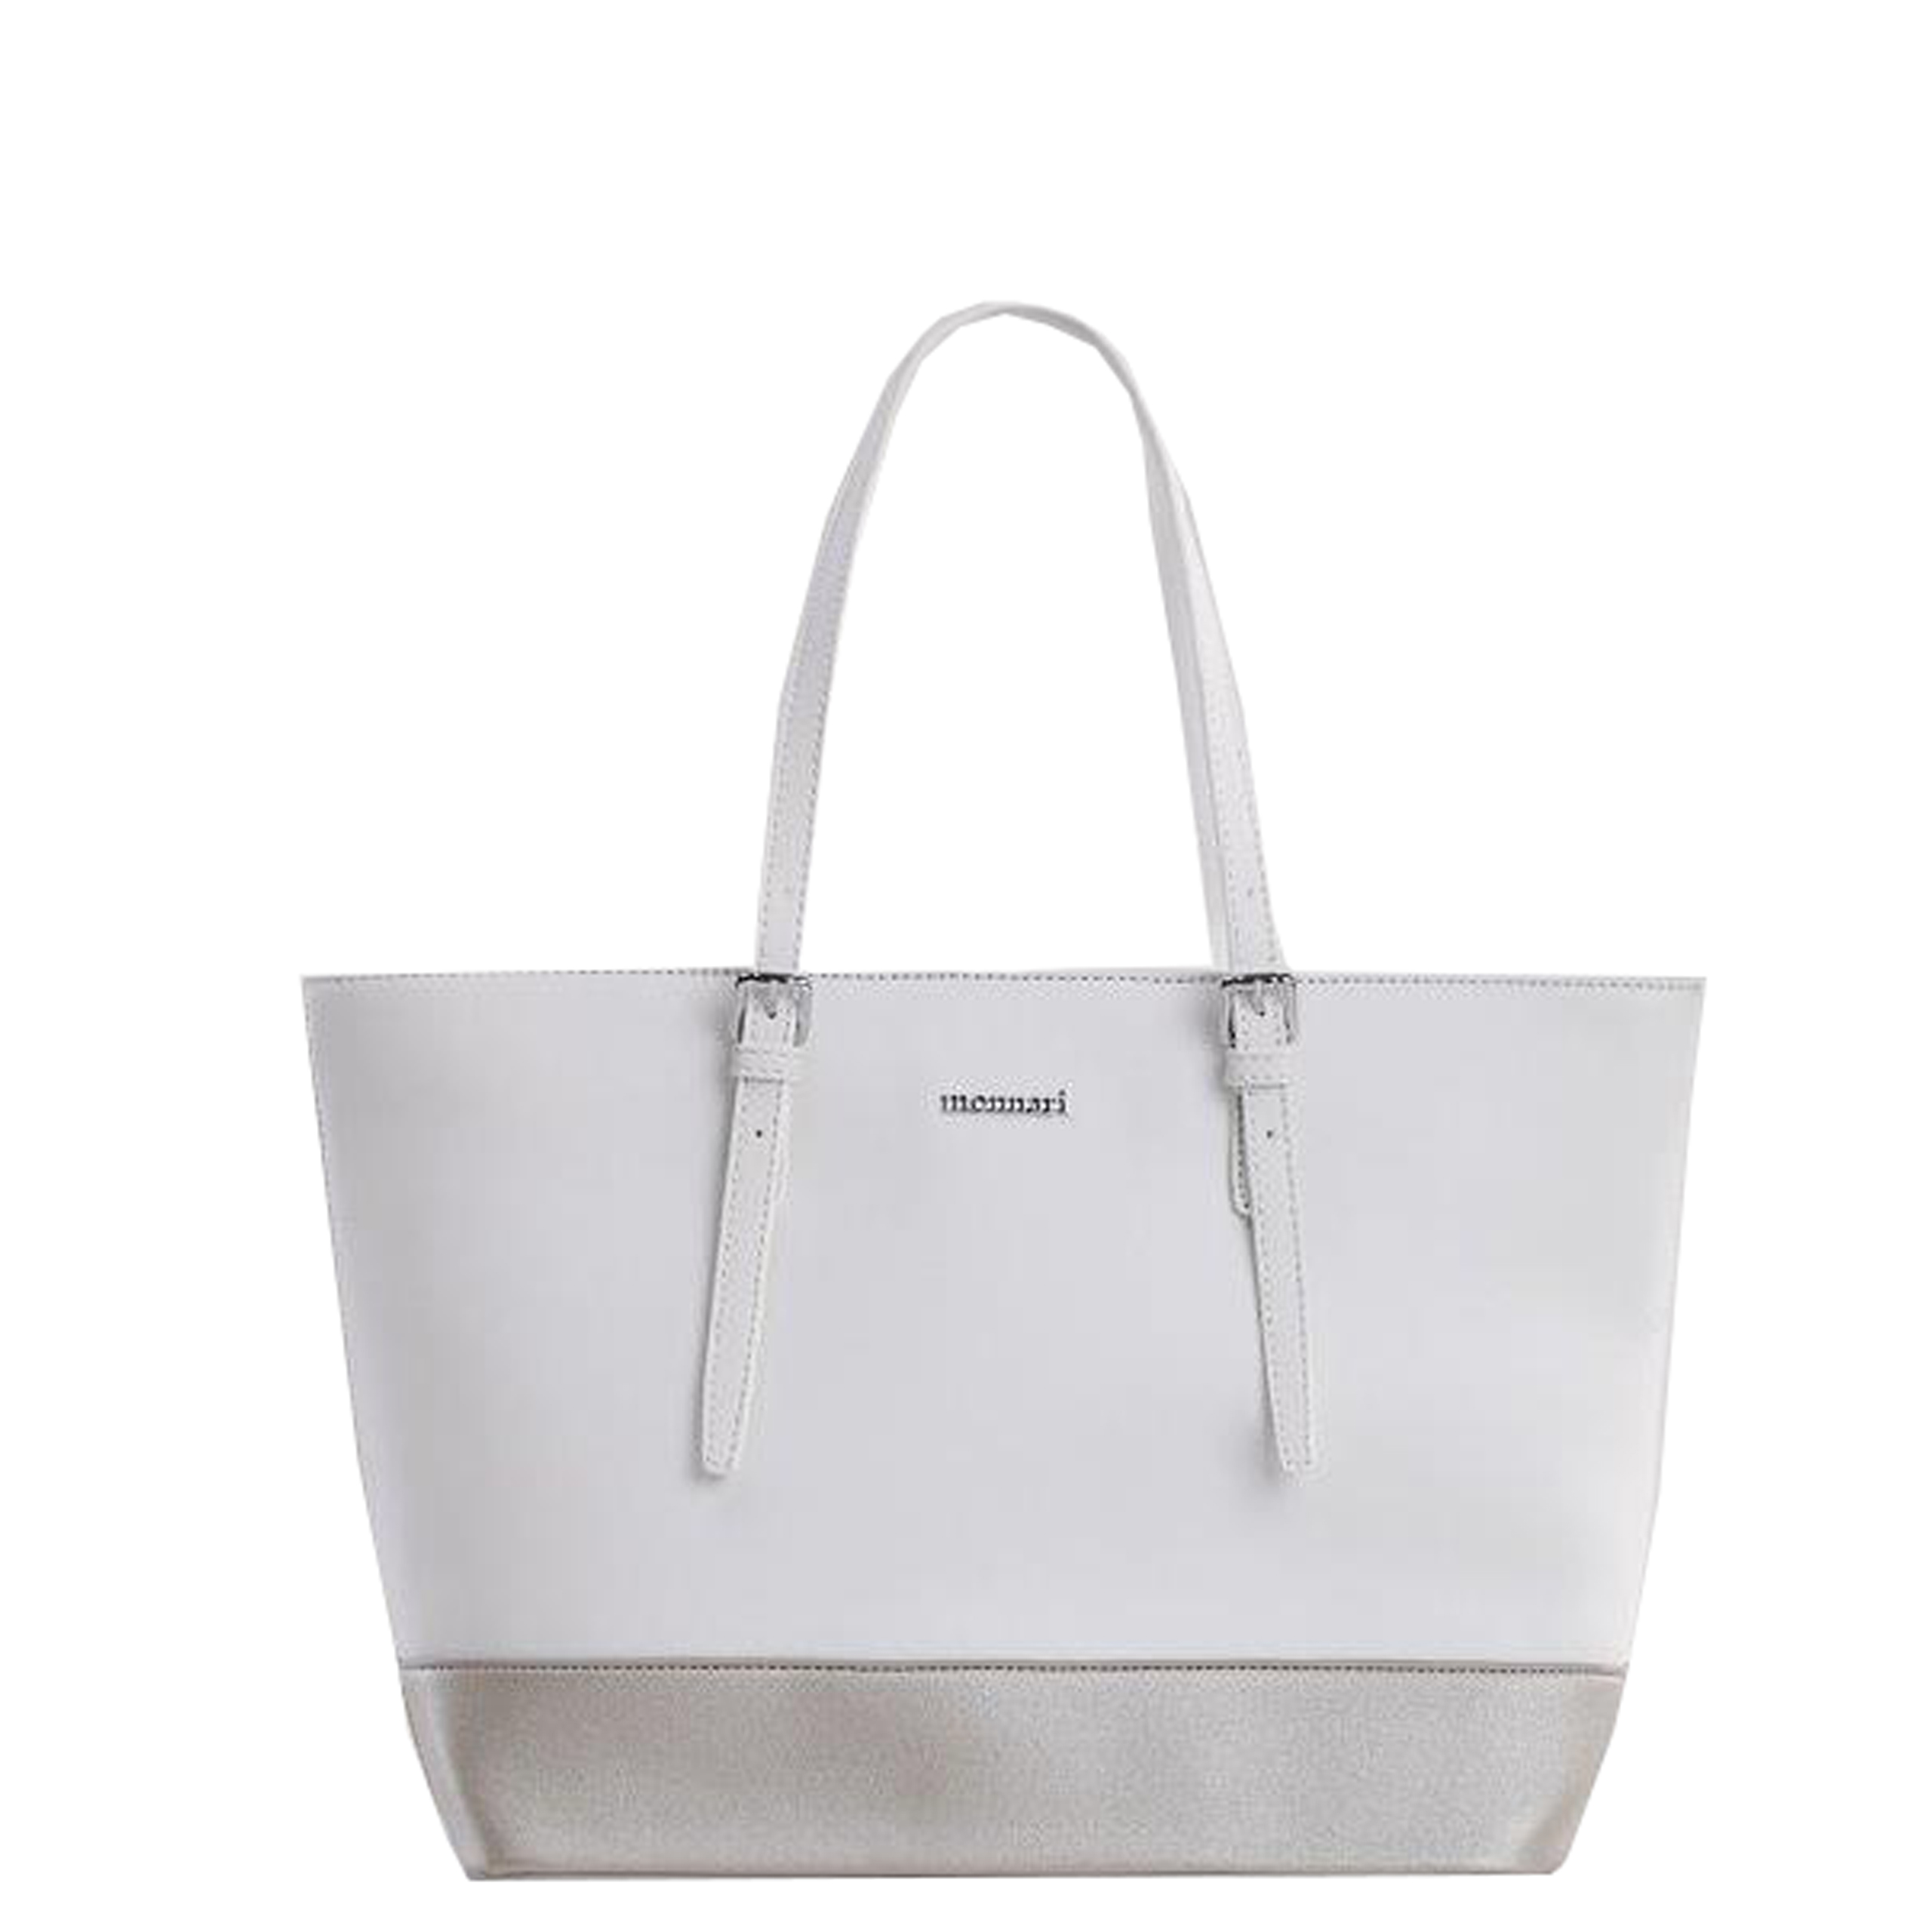 3b6e8017b8447 Torebka Monnari Shopper Bag 8300 PROMOCJA - 7289908945 - oficjalne ...